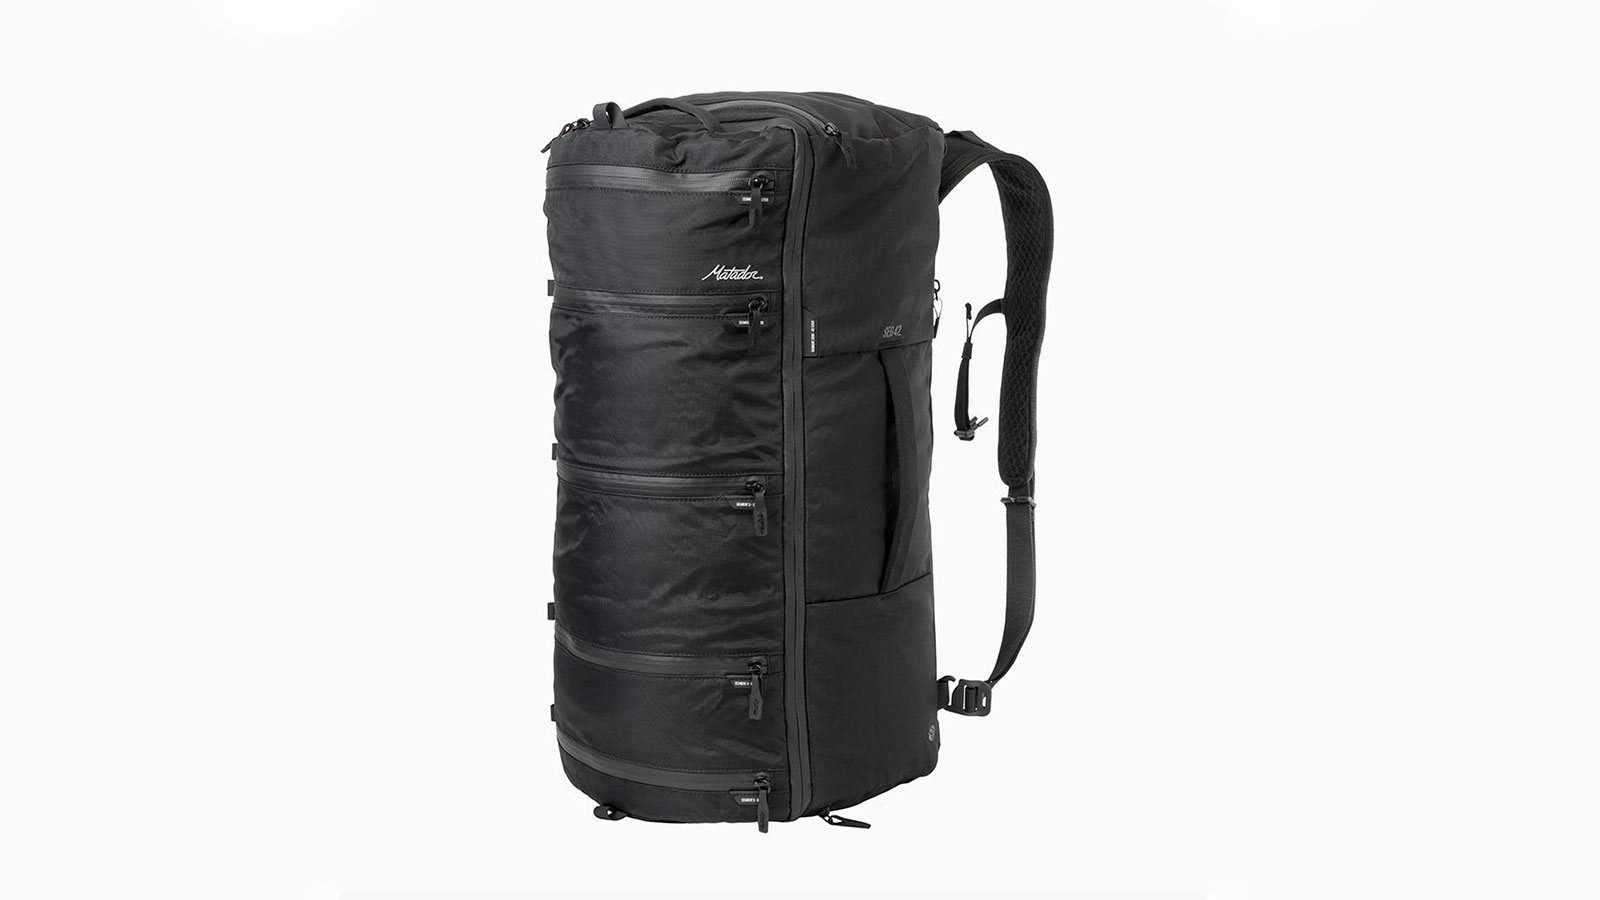 Matador SEG42 One Bag Travel Duffel